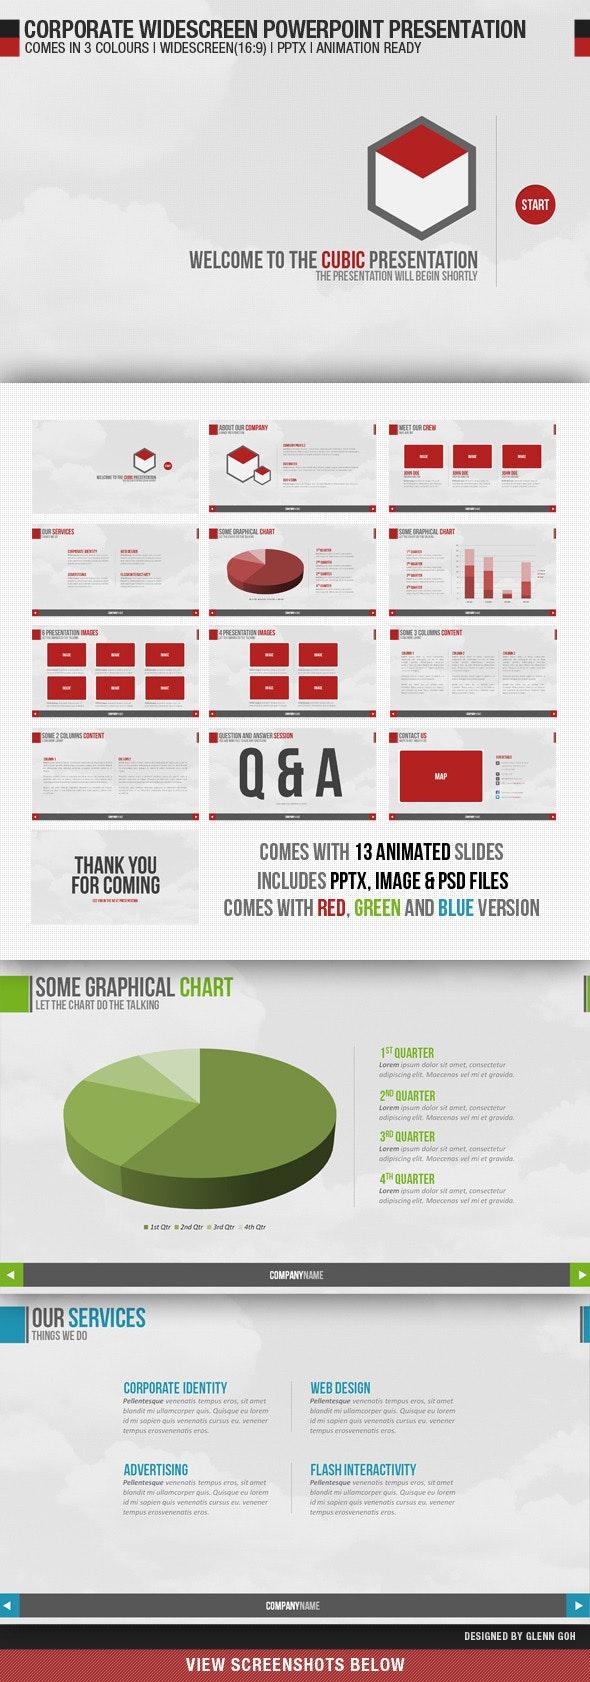 Corporate Widescreen Powerpoint Presentation - Creative PowerPoint Templates